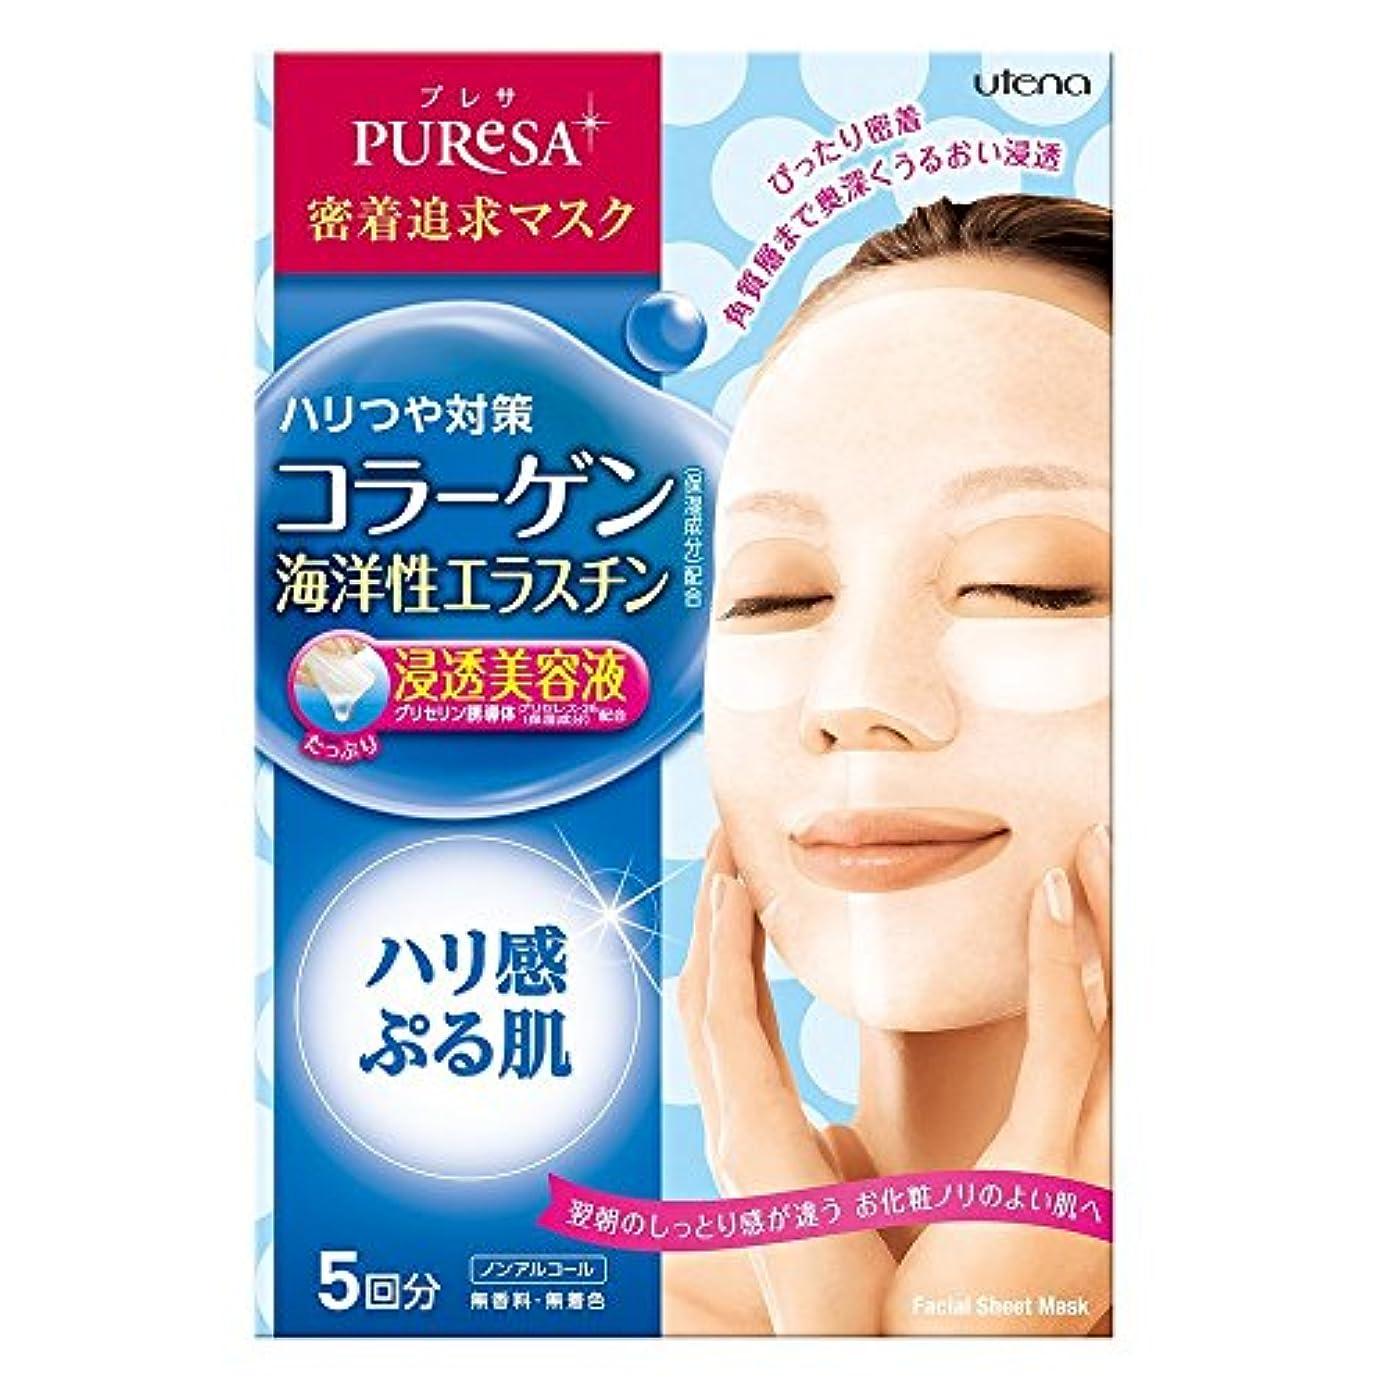 puresa(プレサ) シートマスク コラーゲン 15mL×5枚入 × 6個